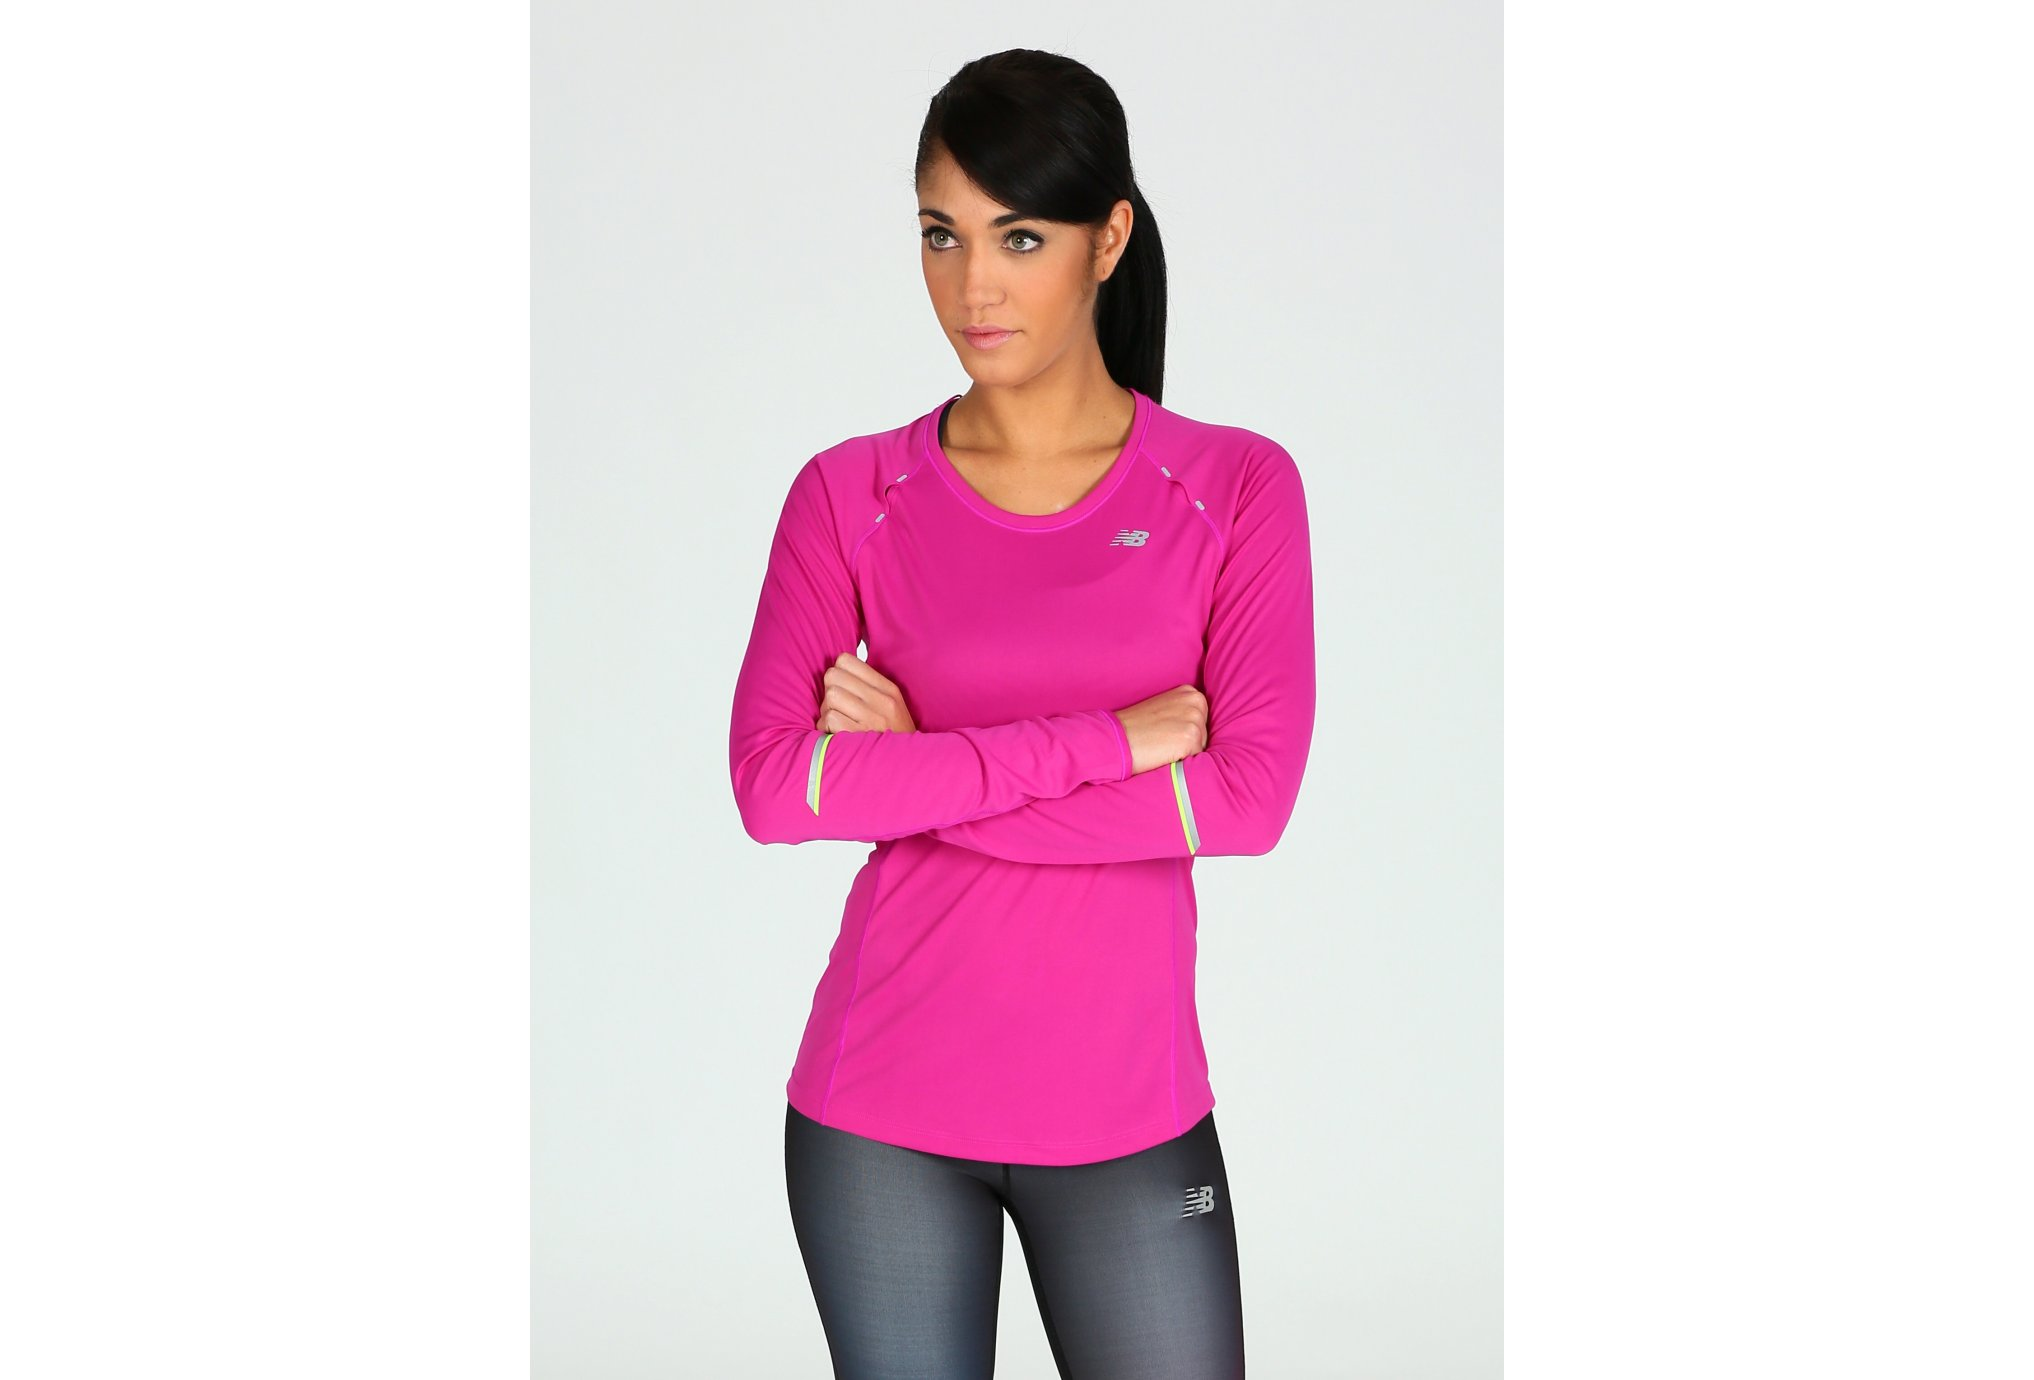 acheter pas cher 1ed68 ce118 La Fortifiée - New Balance Ice W vêtement running femme